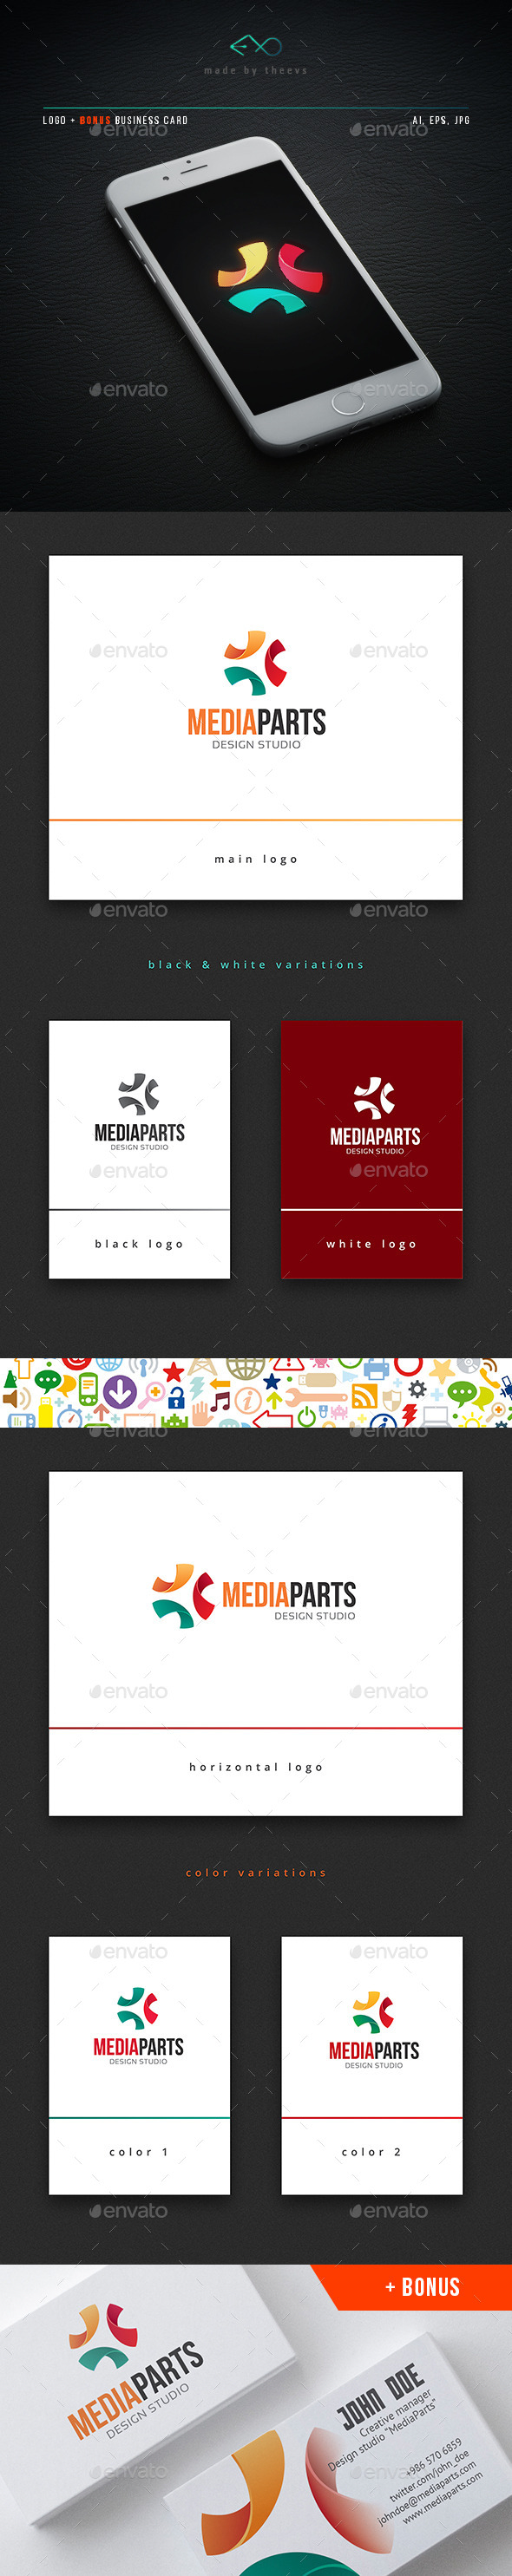 MediaParts